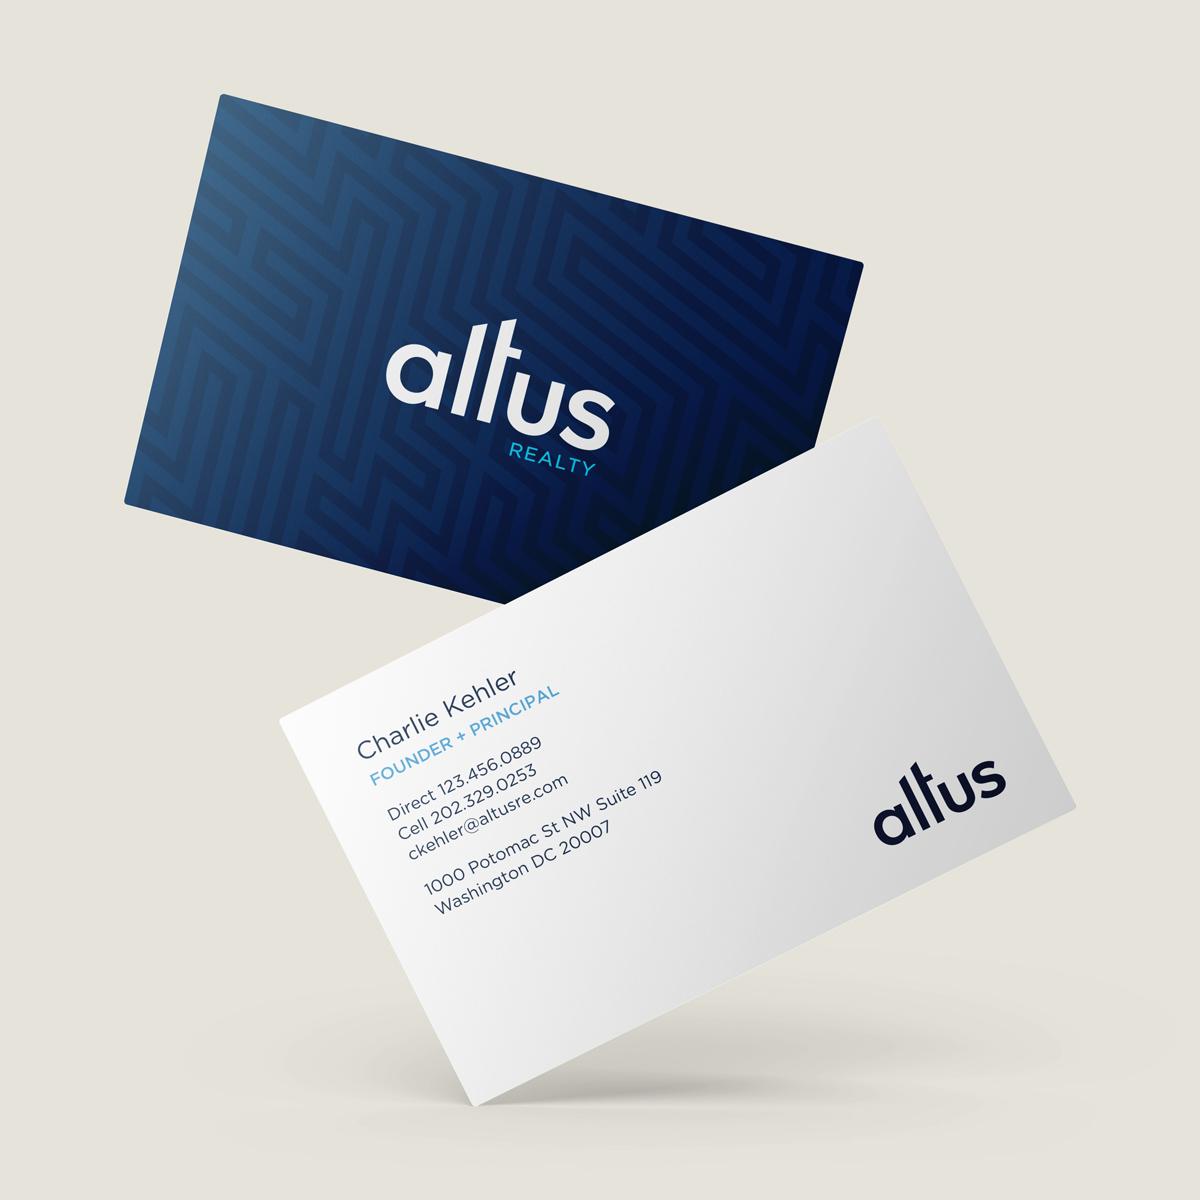 altus_cards_2.jpg